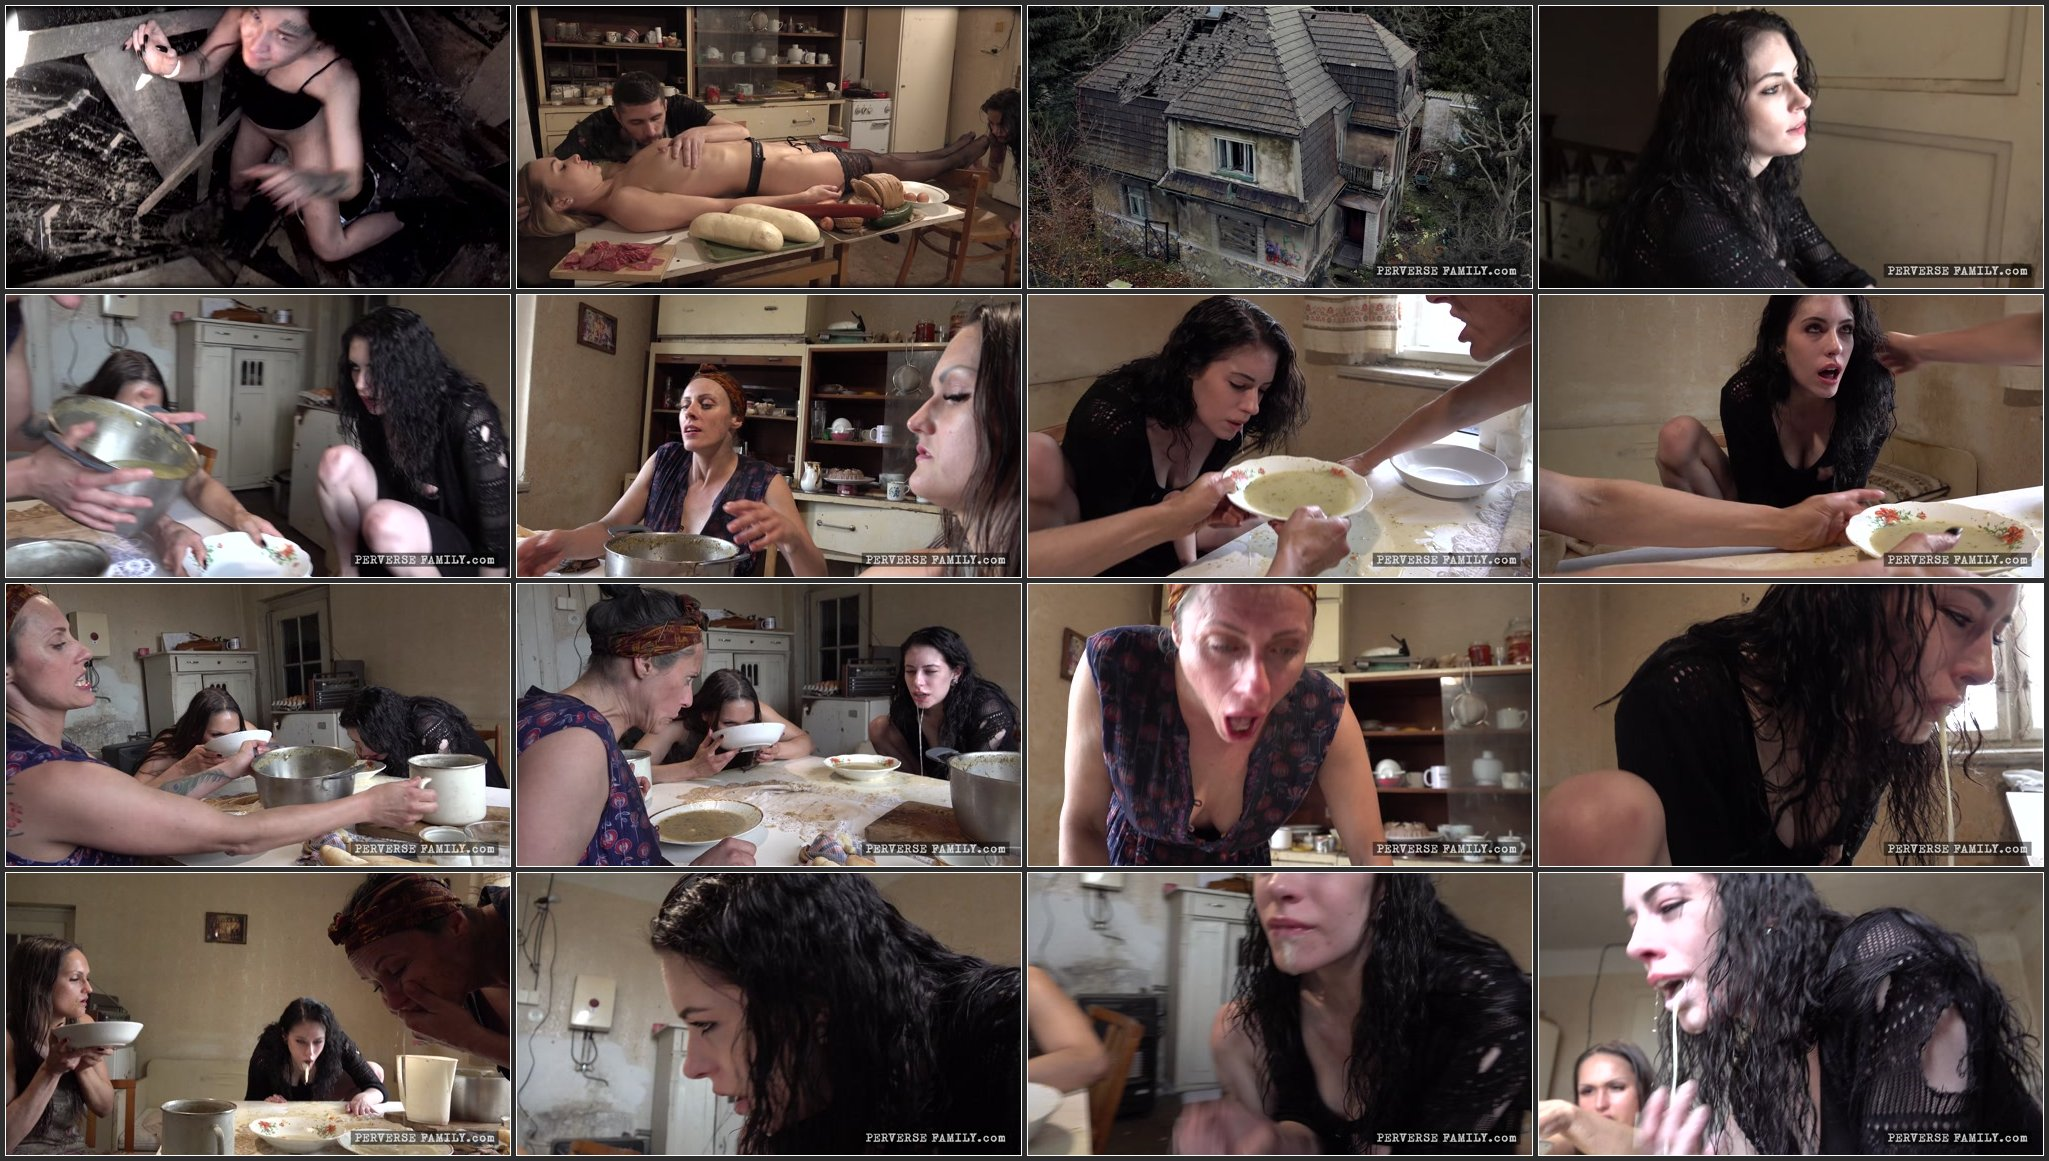 perverse-family-food-poison-3840x2160.ScrinList